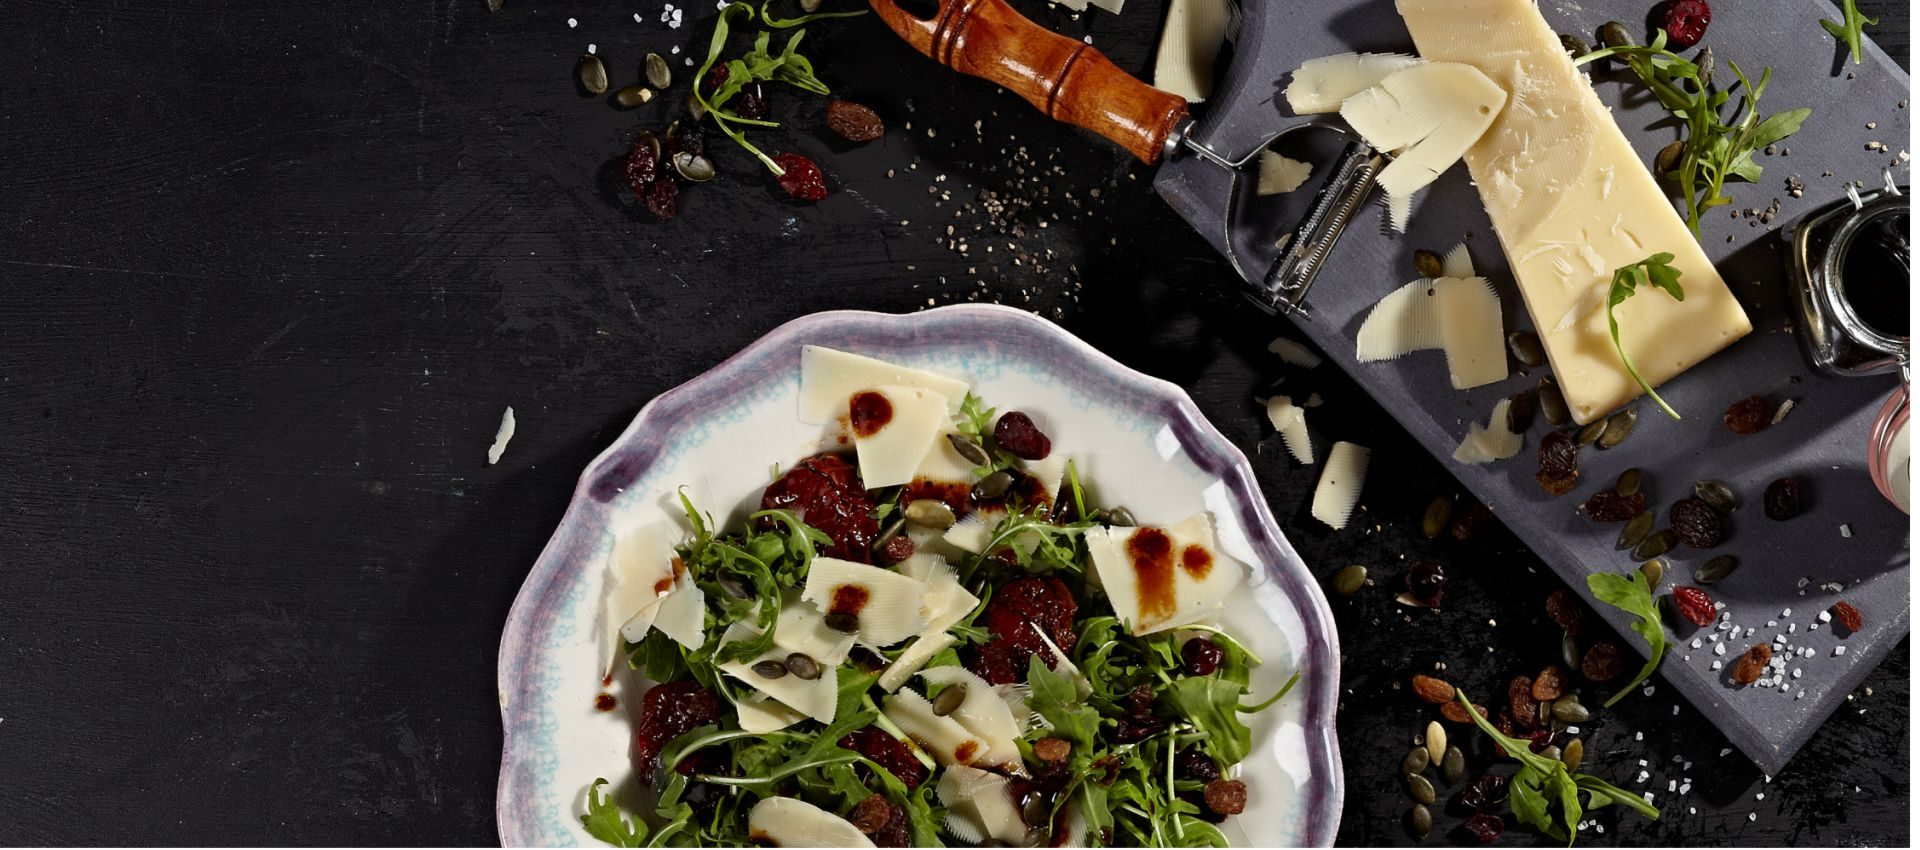 Wild rocket salad with Violife Prosociano